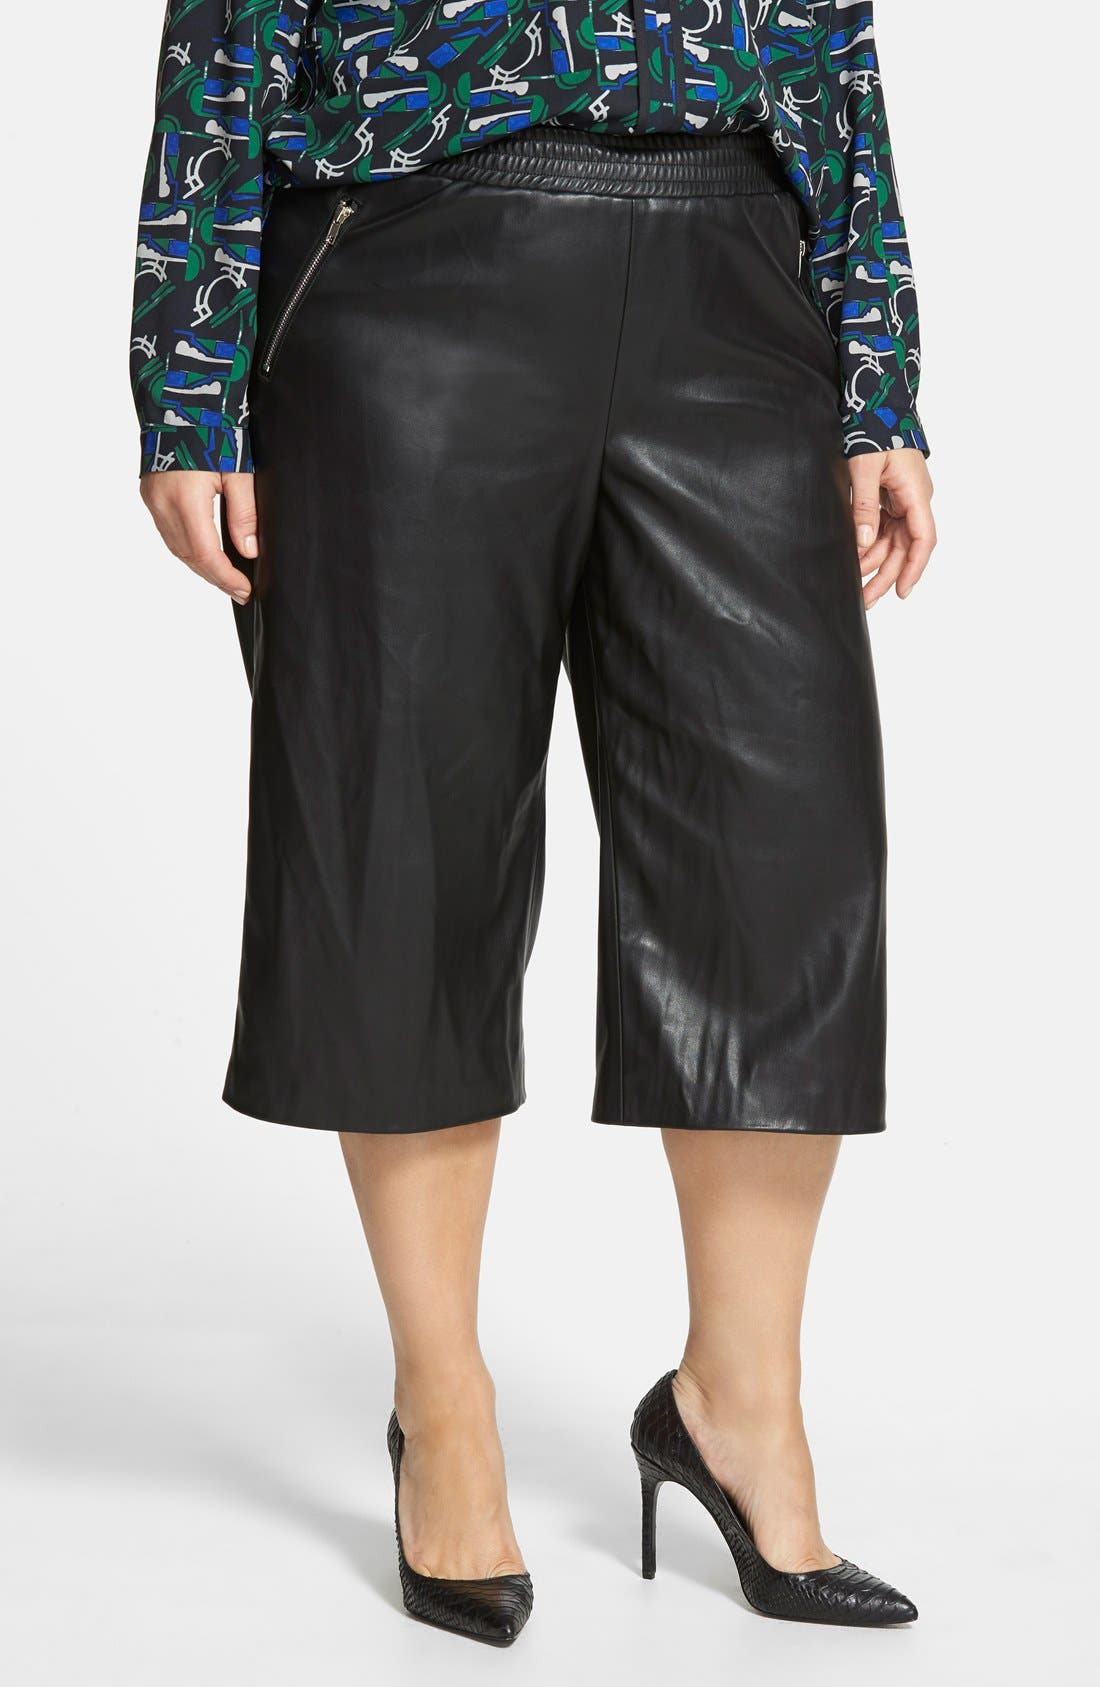 ELOQUII Studio Faux Leather Culottes, Main, color, 001